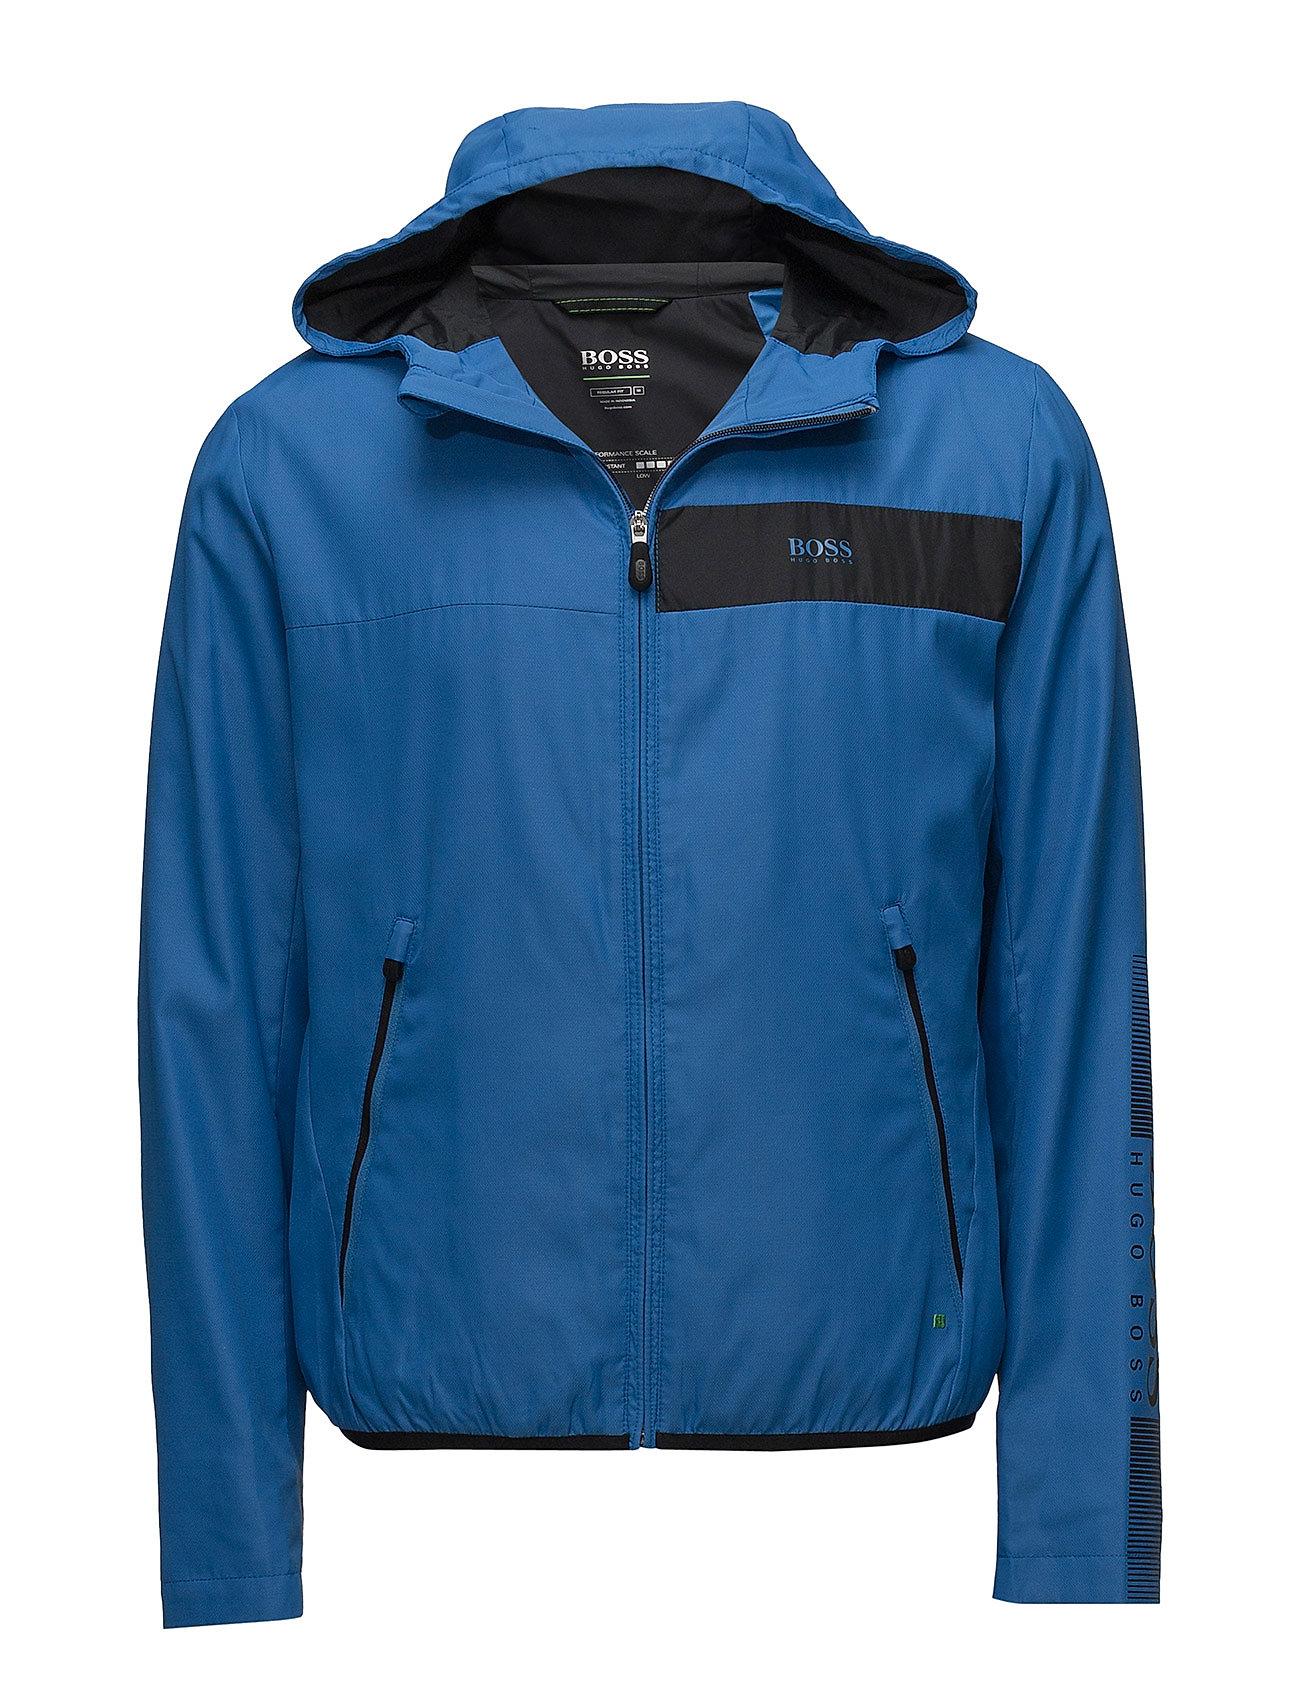 Boss Athleisure Wear Jeltech 1 - BRIGHT BLUE